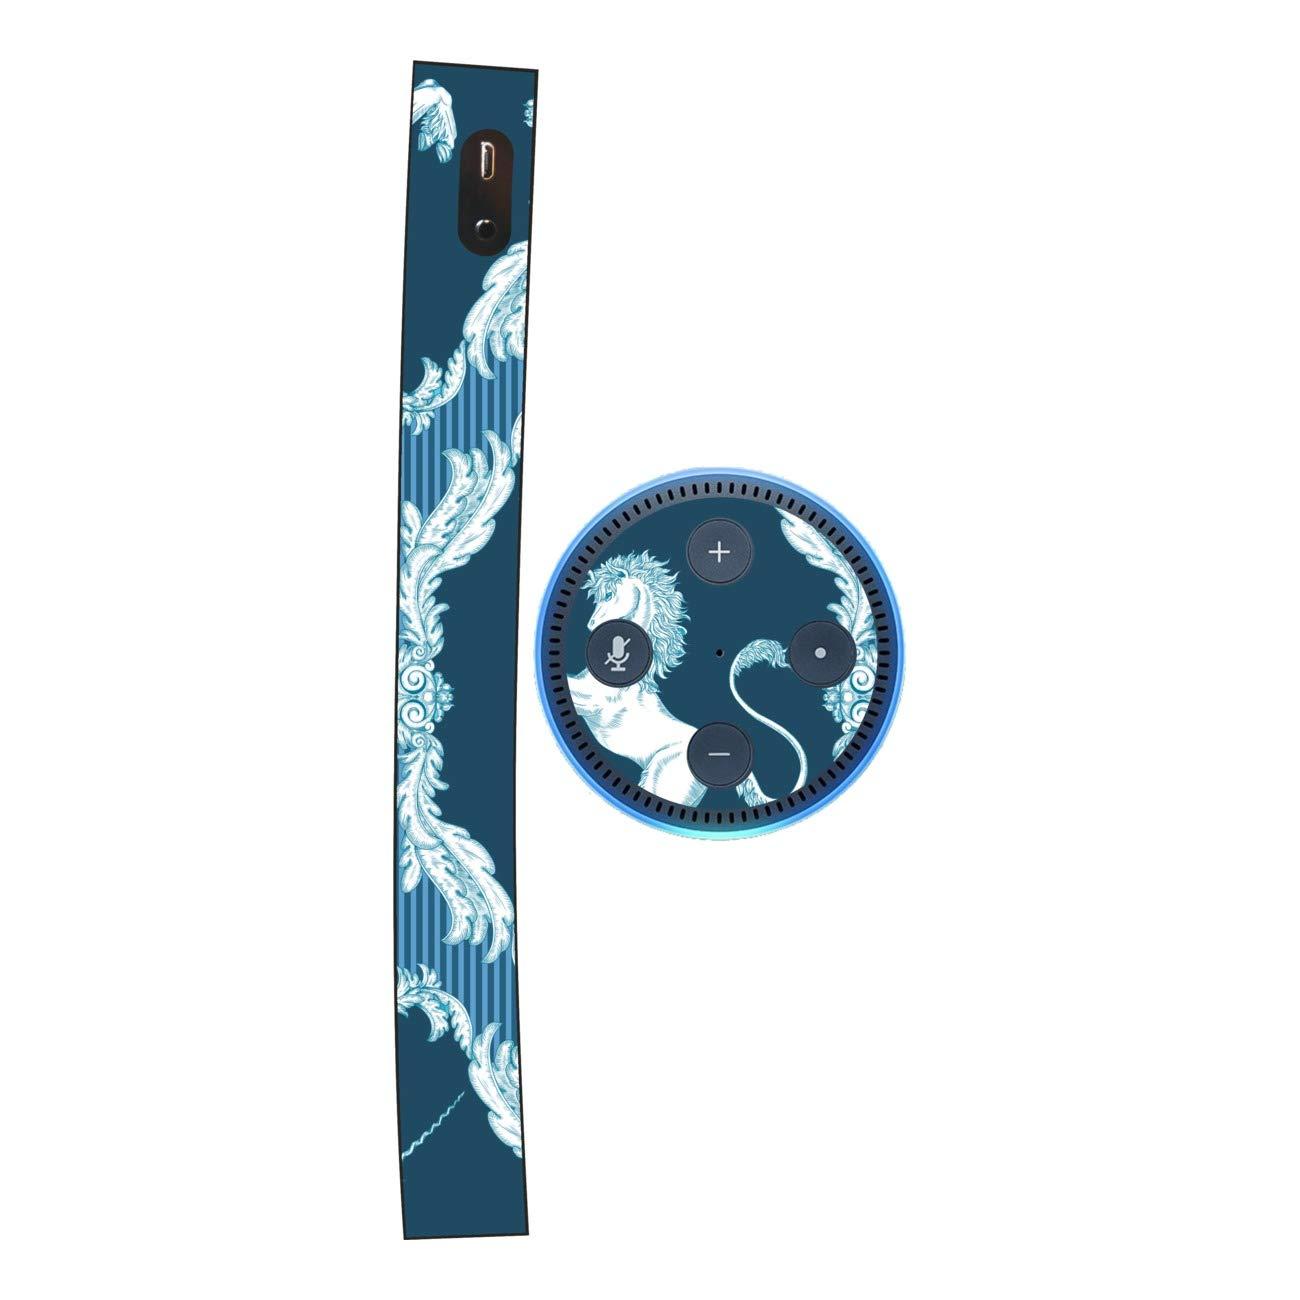 DISAGU SF SDI 5436_ 1132Design Schermo per  Echo DOT–Motivo Classico Unicorno Motivo a Strisce Blu SF-sdi-5436_1132